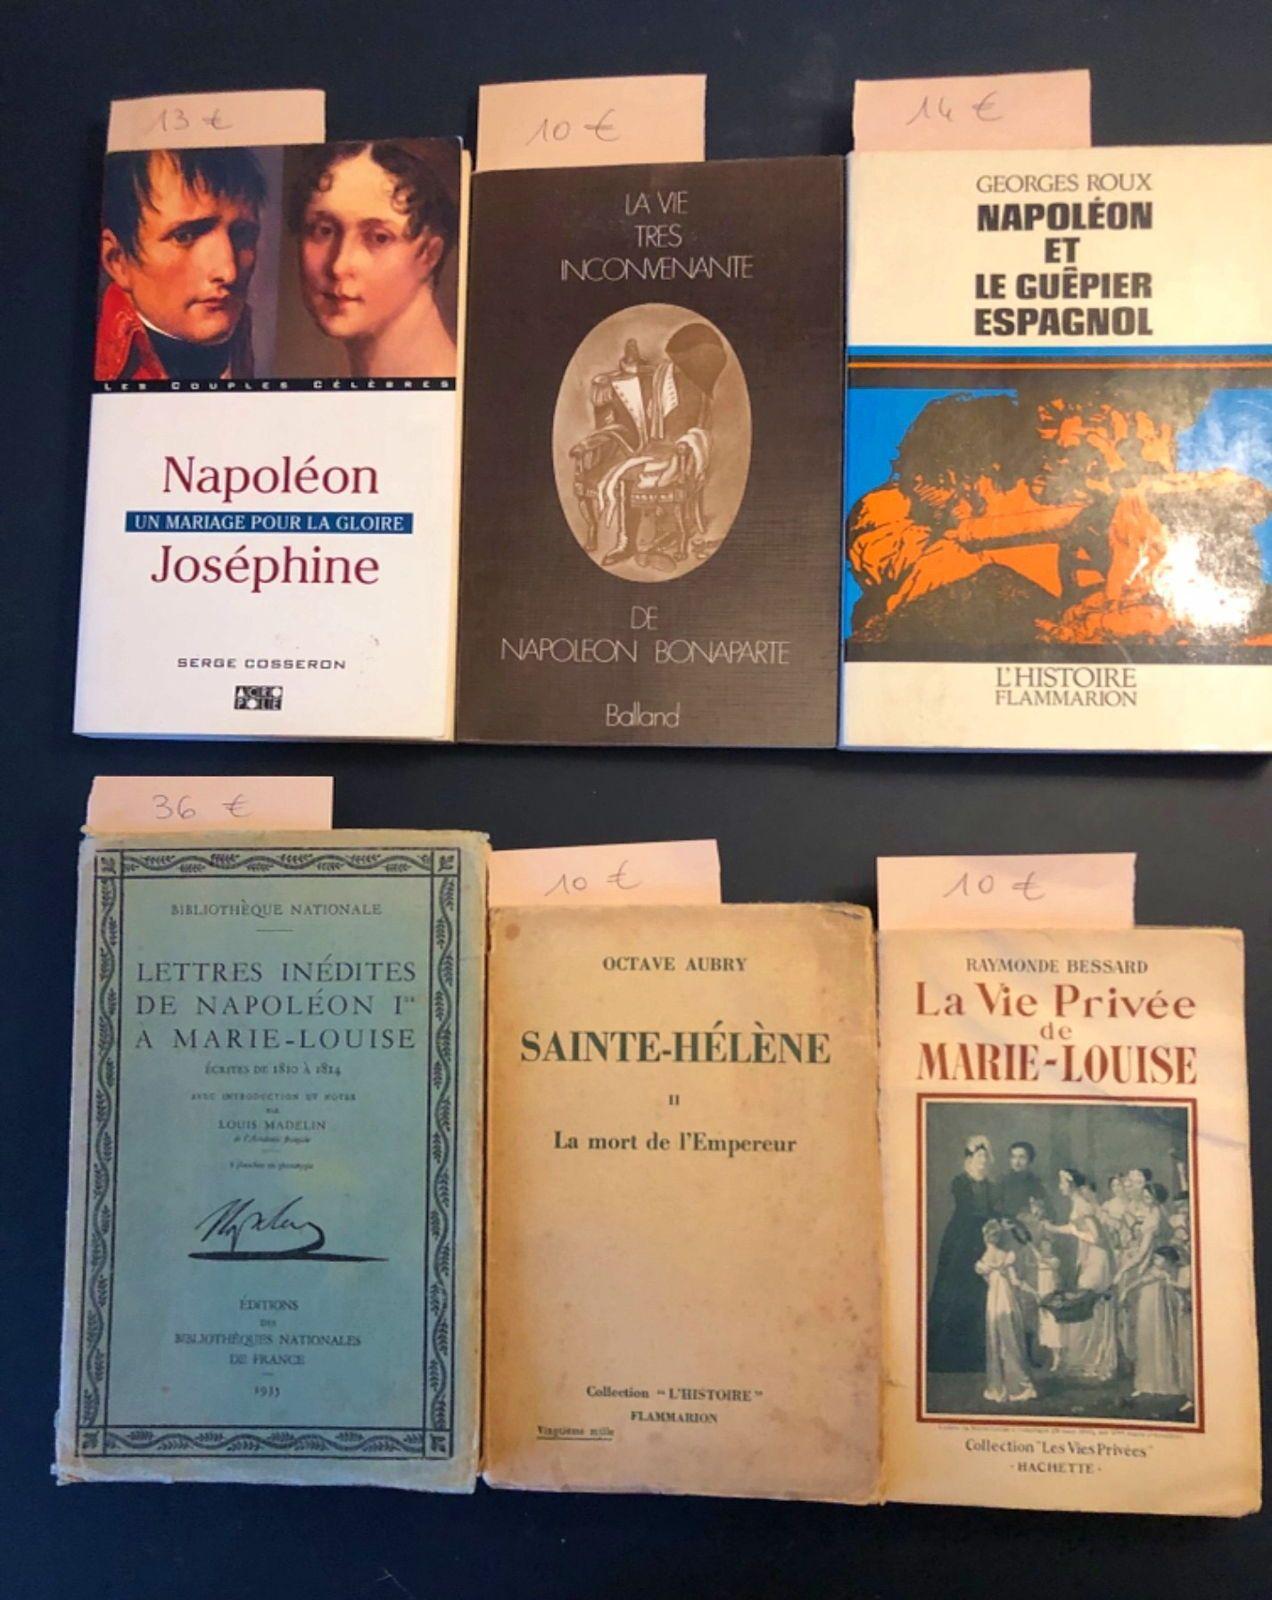 12livres anciens sur Napoléon